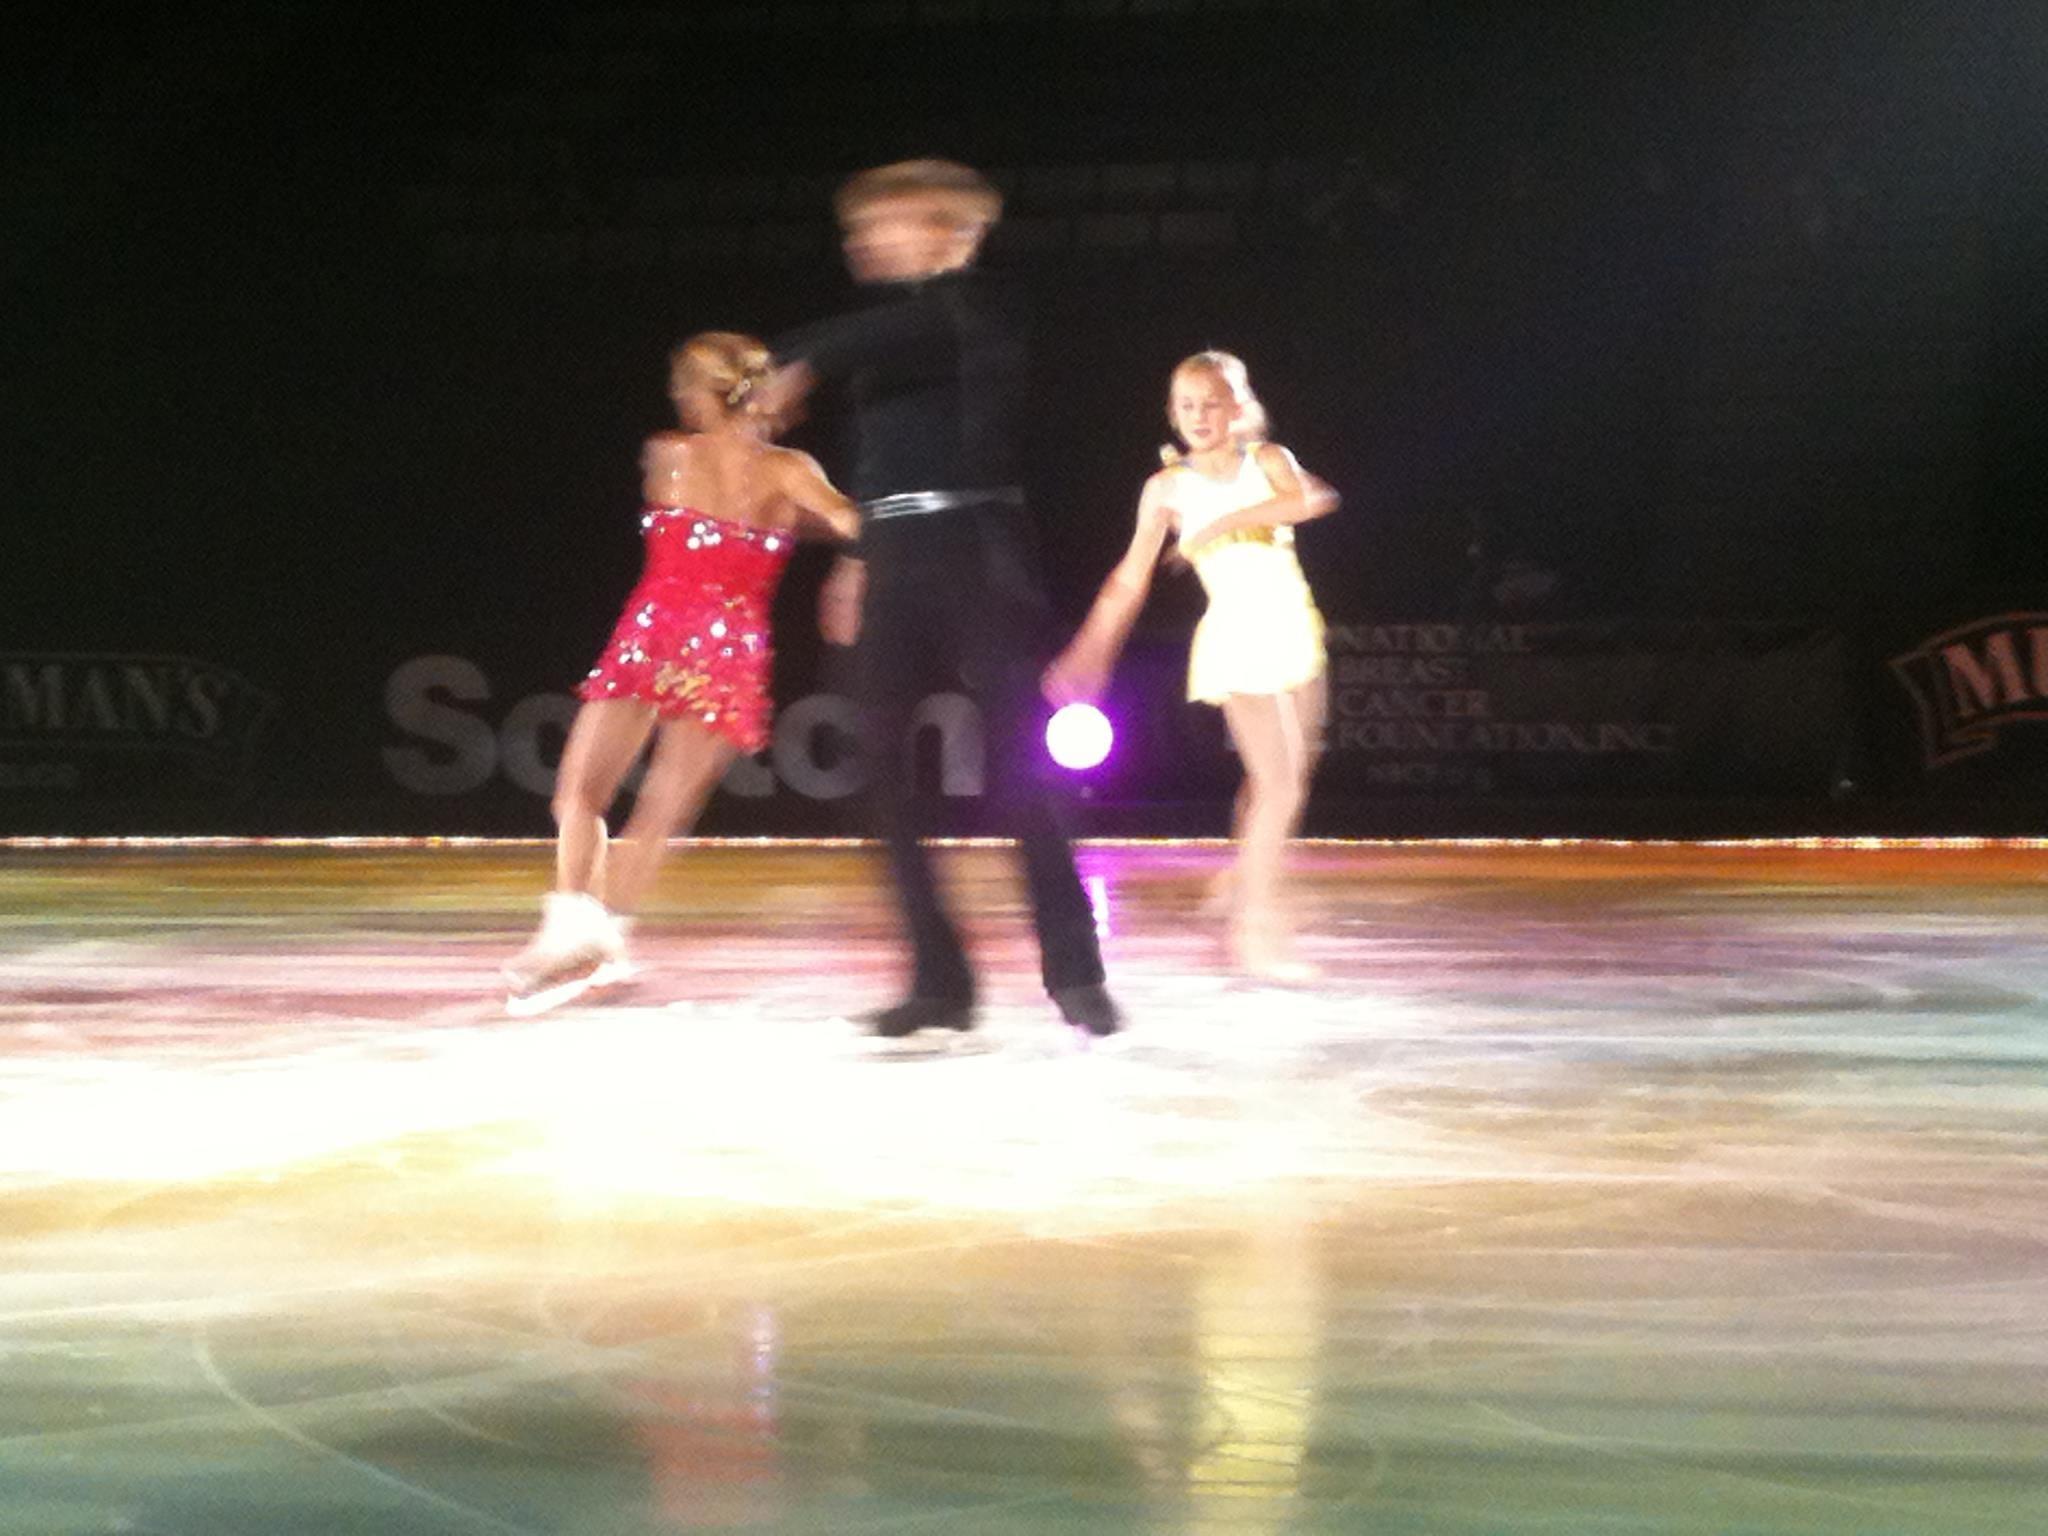 Ilia Kulik, Katia Gordeeva, and their graceful daughter